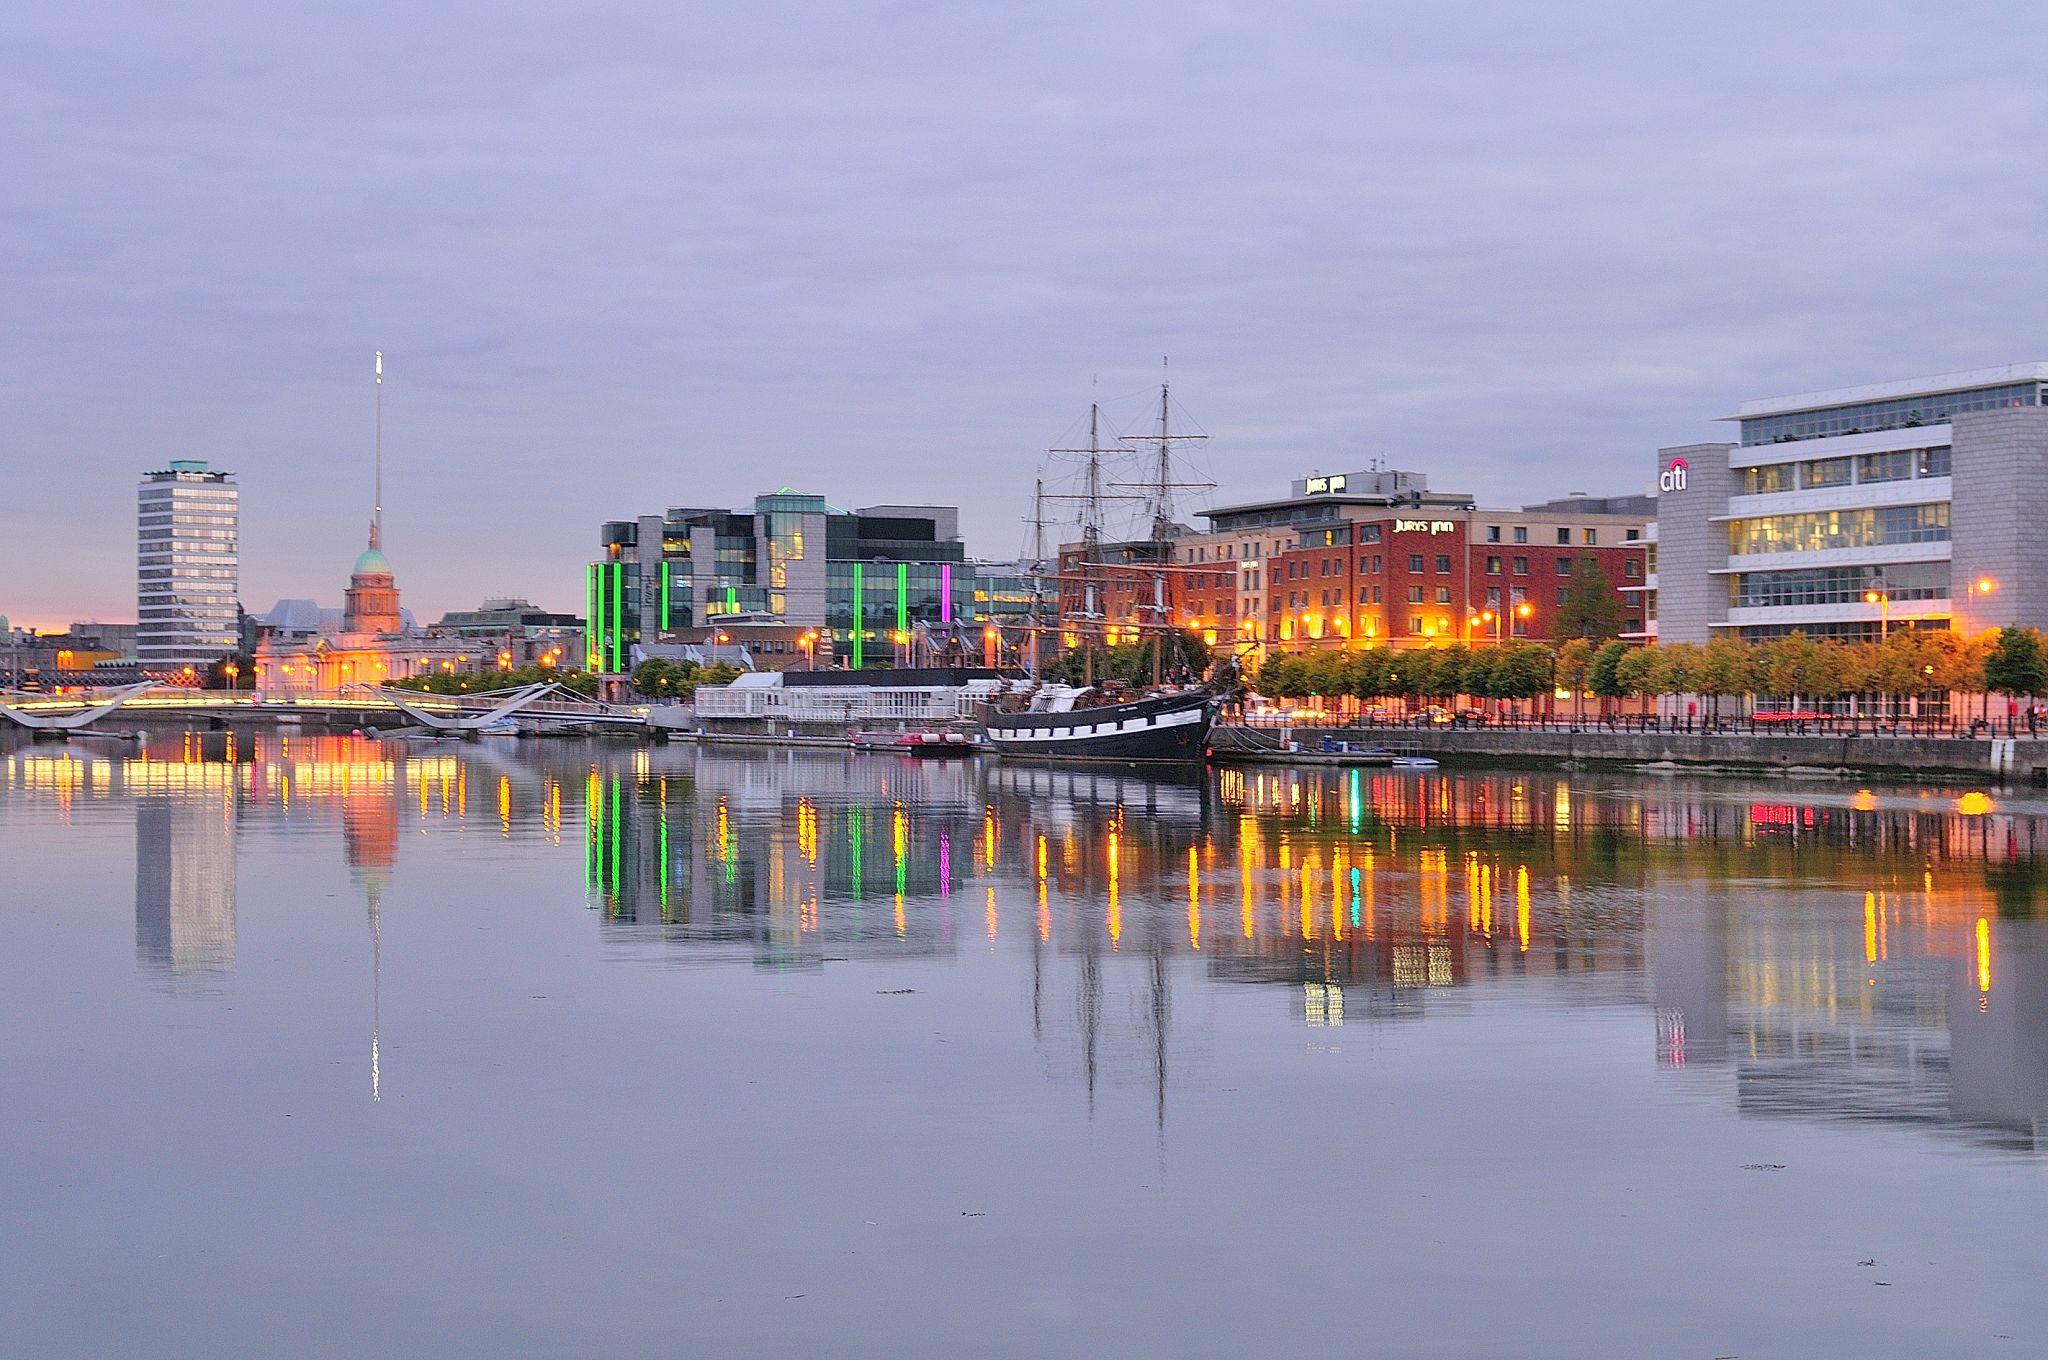 Side of River Liffey, Dublin, Ireland